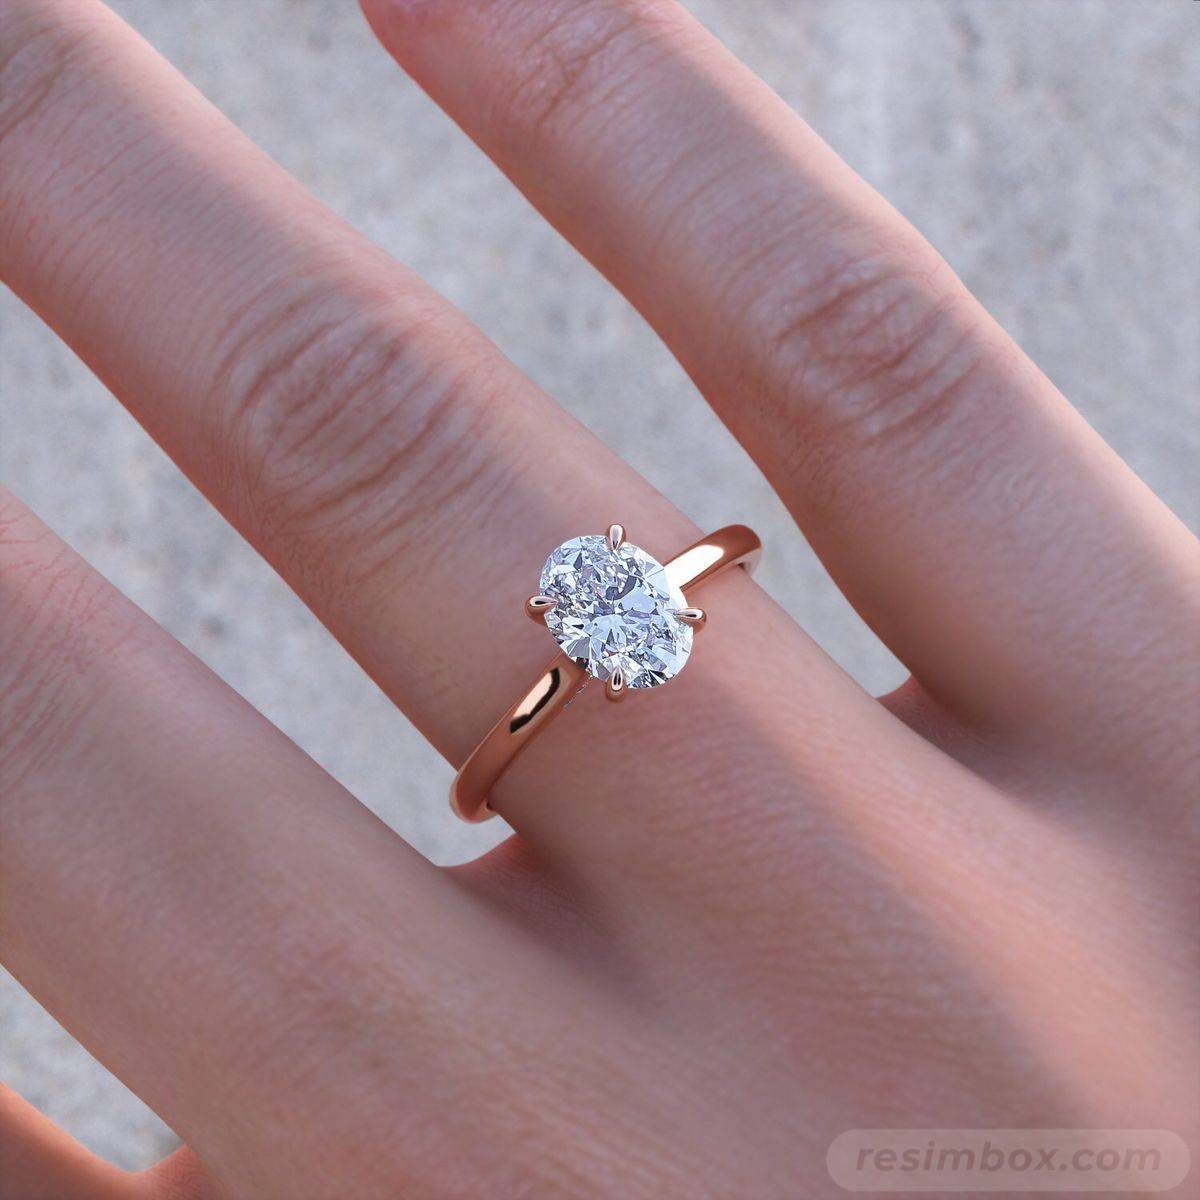 Art deco engagement ring-614671049122102649